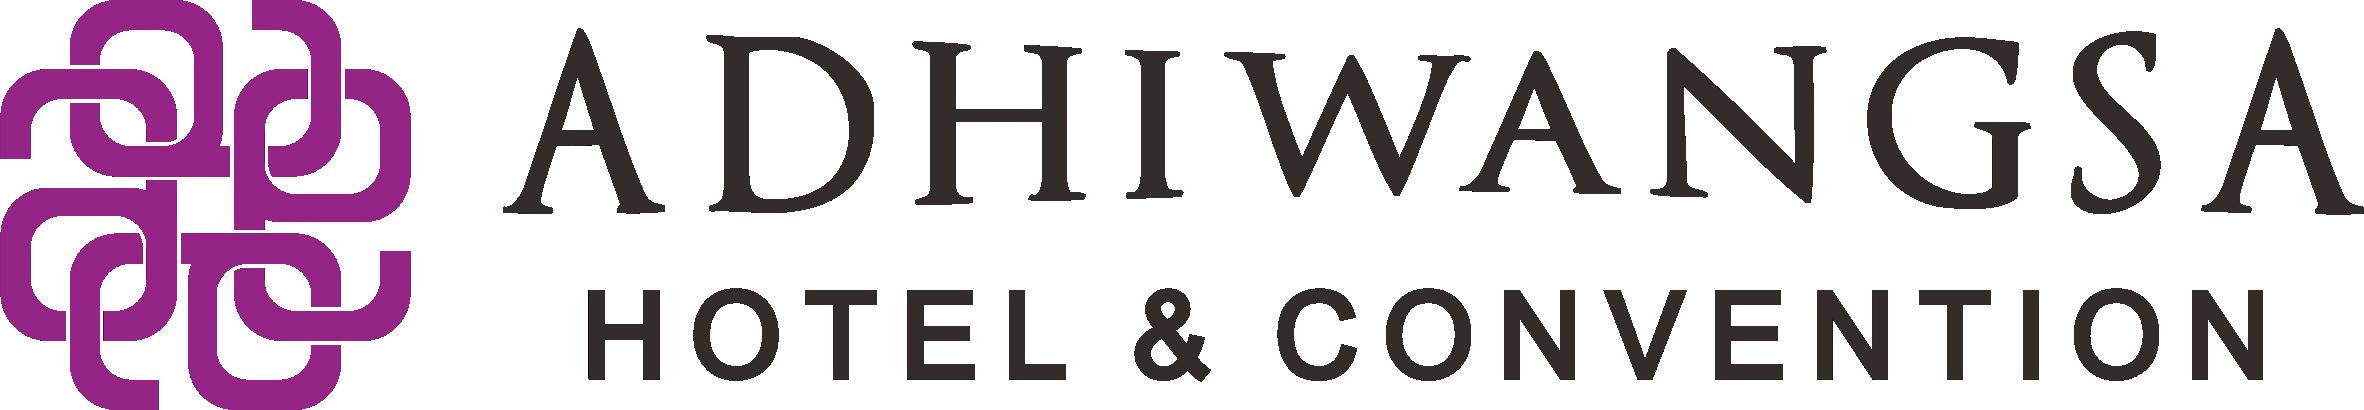 The Adhiwangsa Hotel